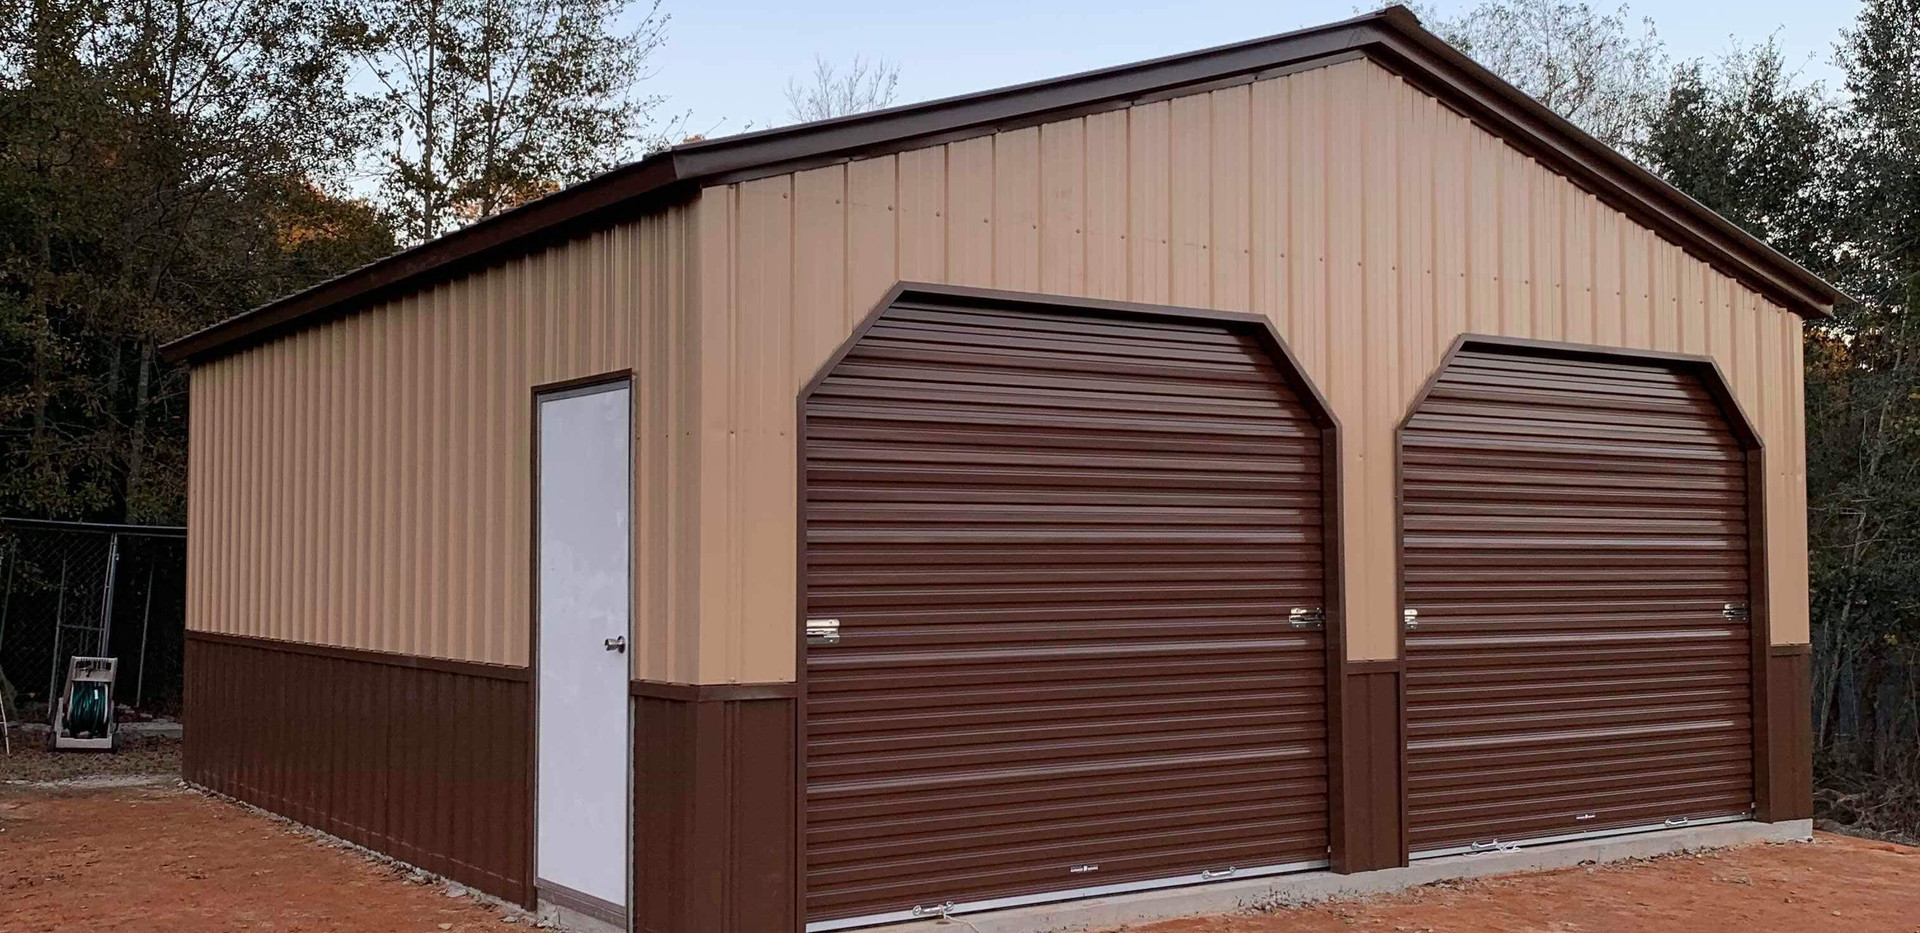 All vertical Garages